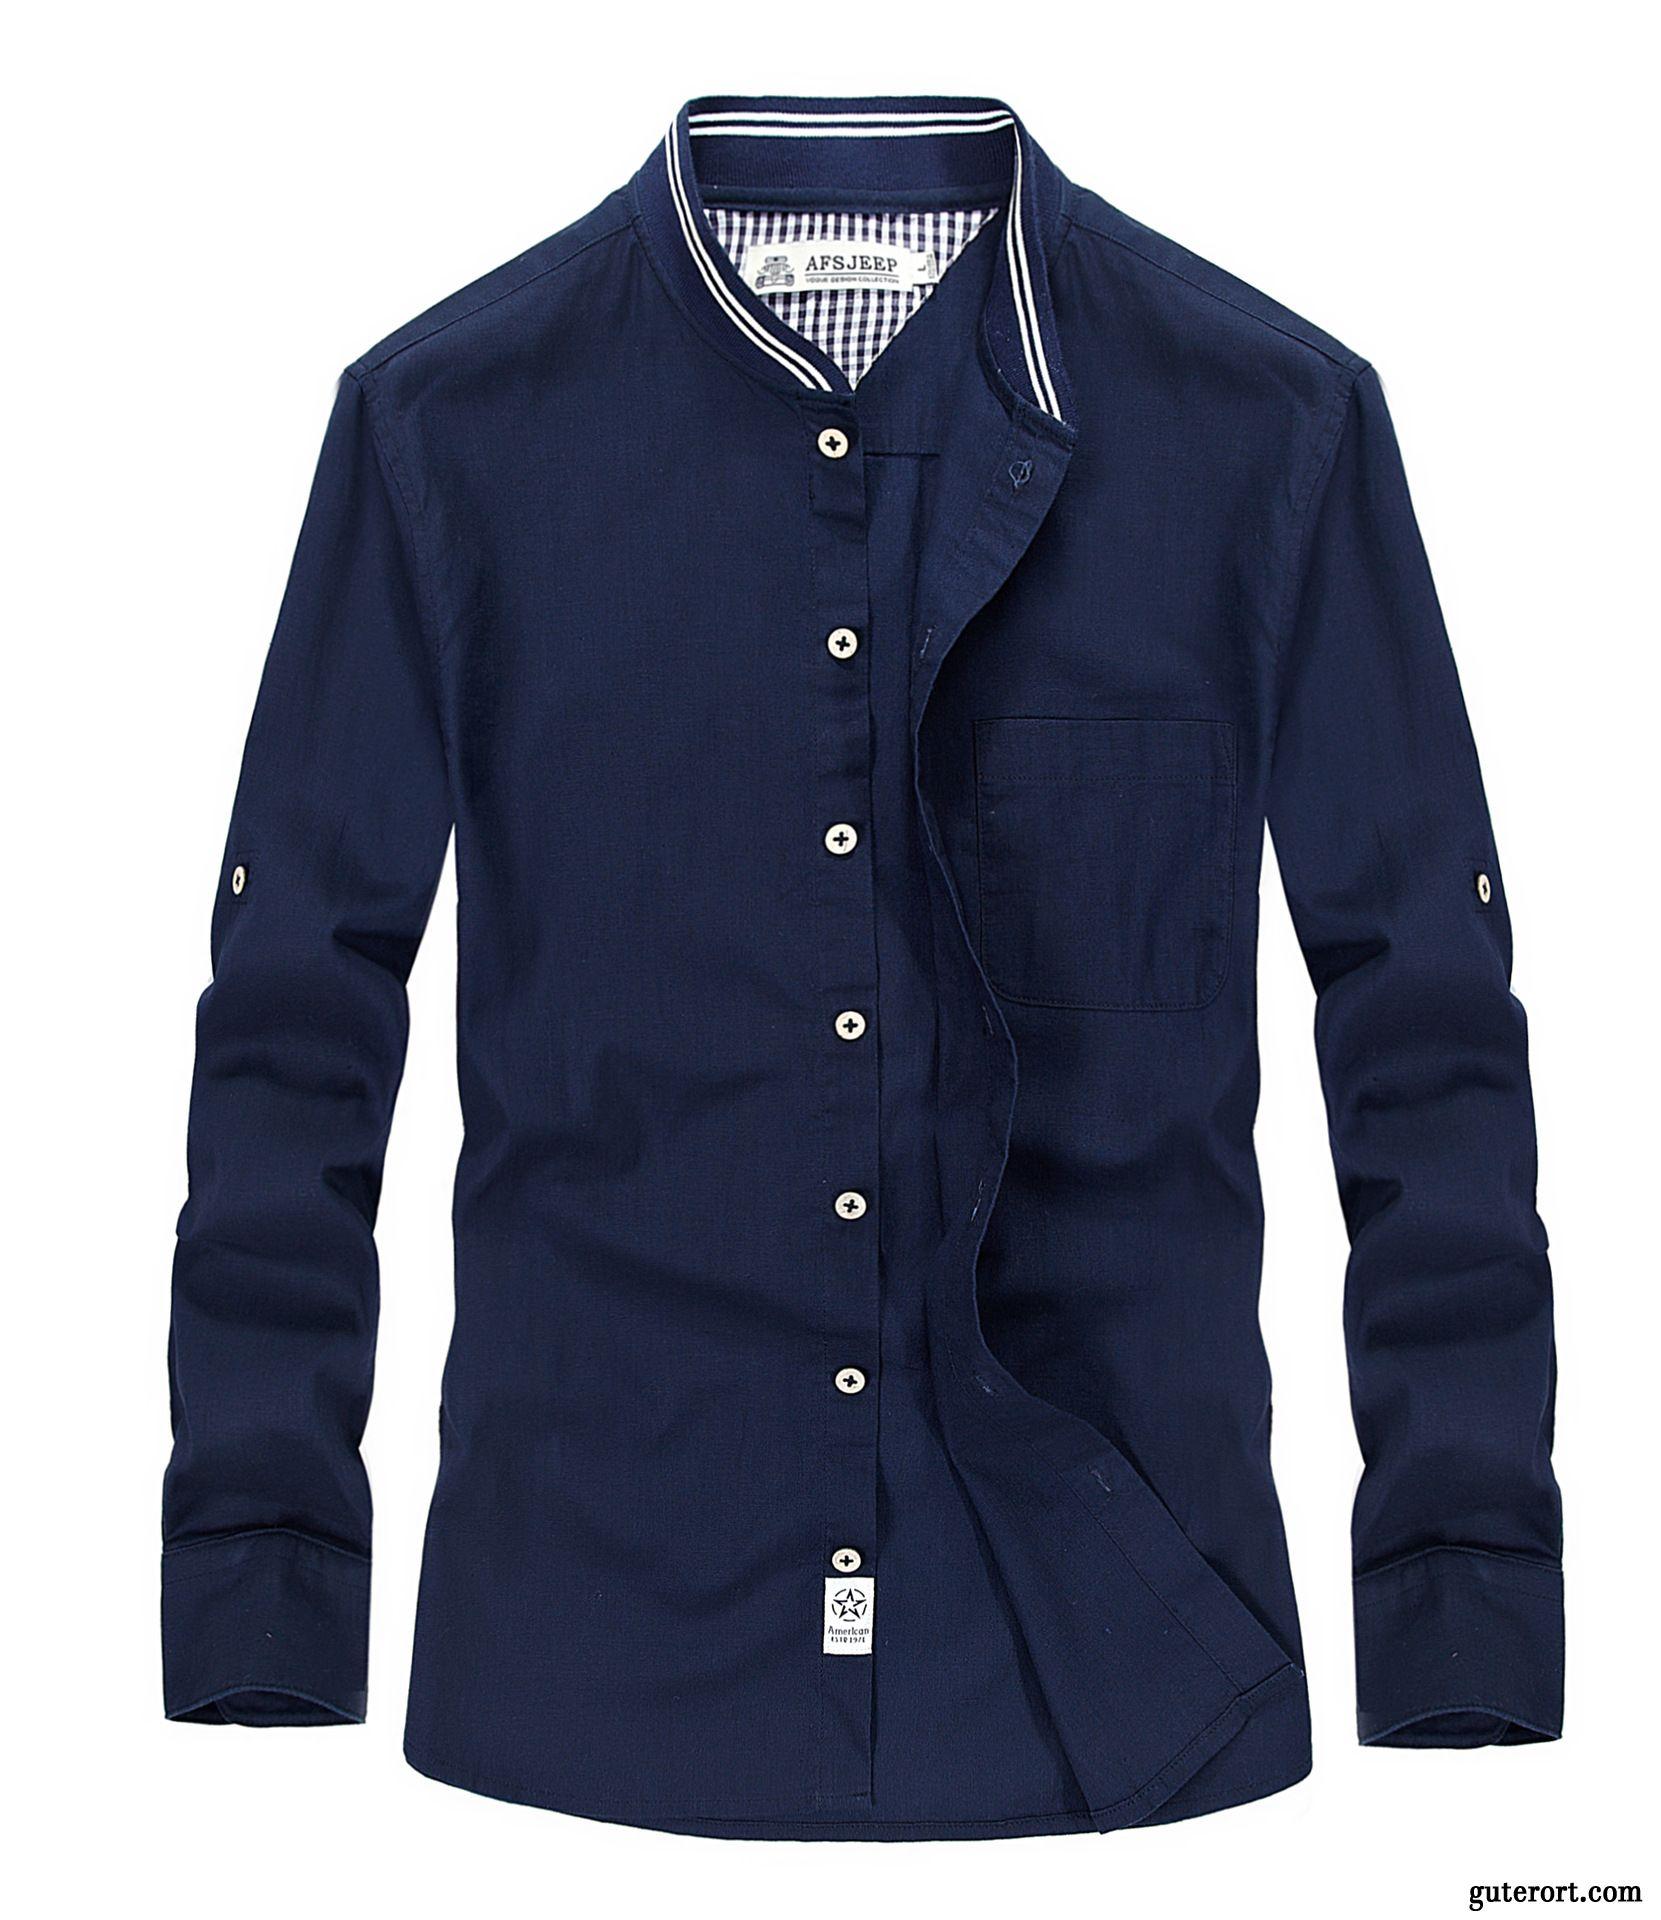 52e424c3df91db Hemd Rot Schwarz Kariert Herren Marineblau, Billige Hemden Rabatt